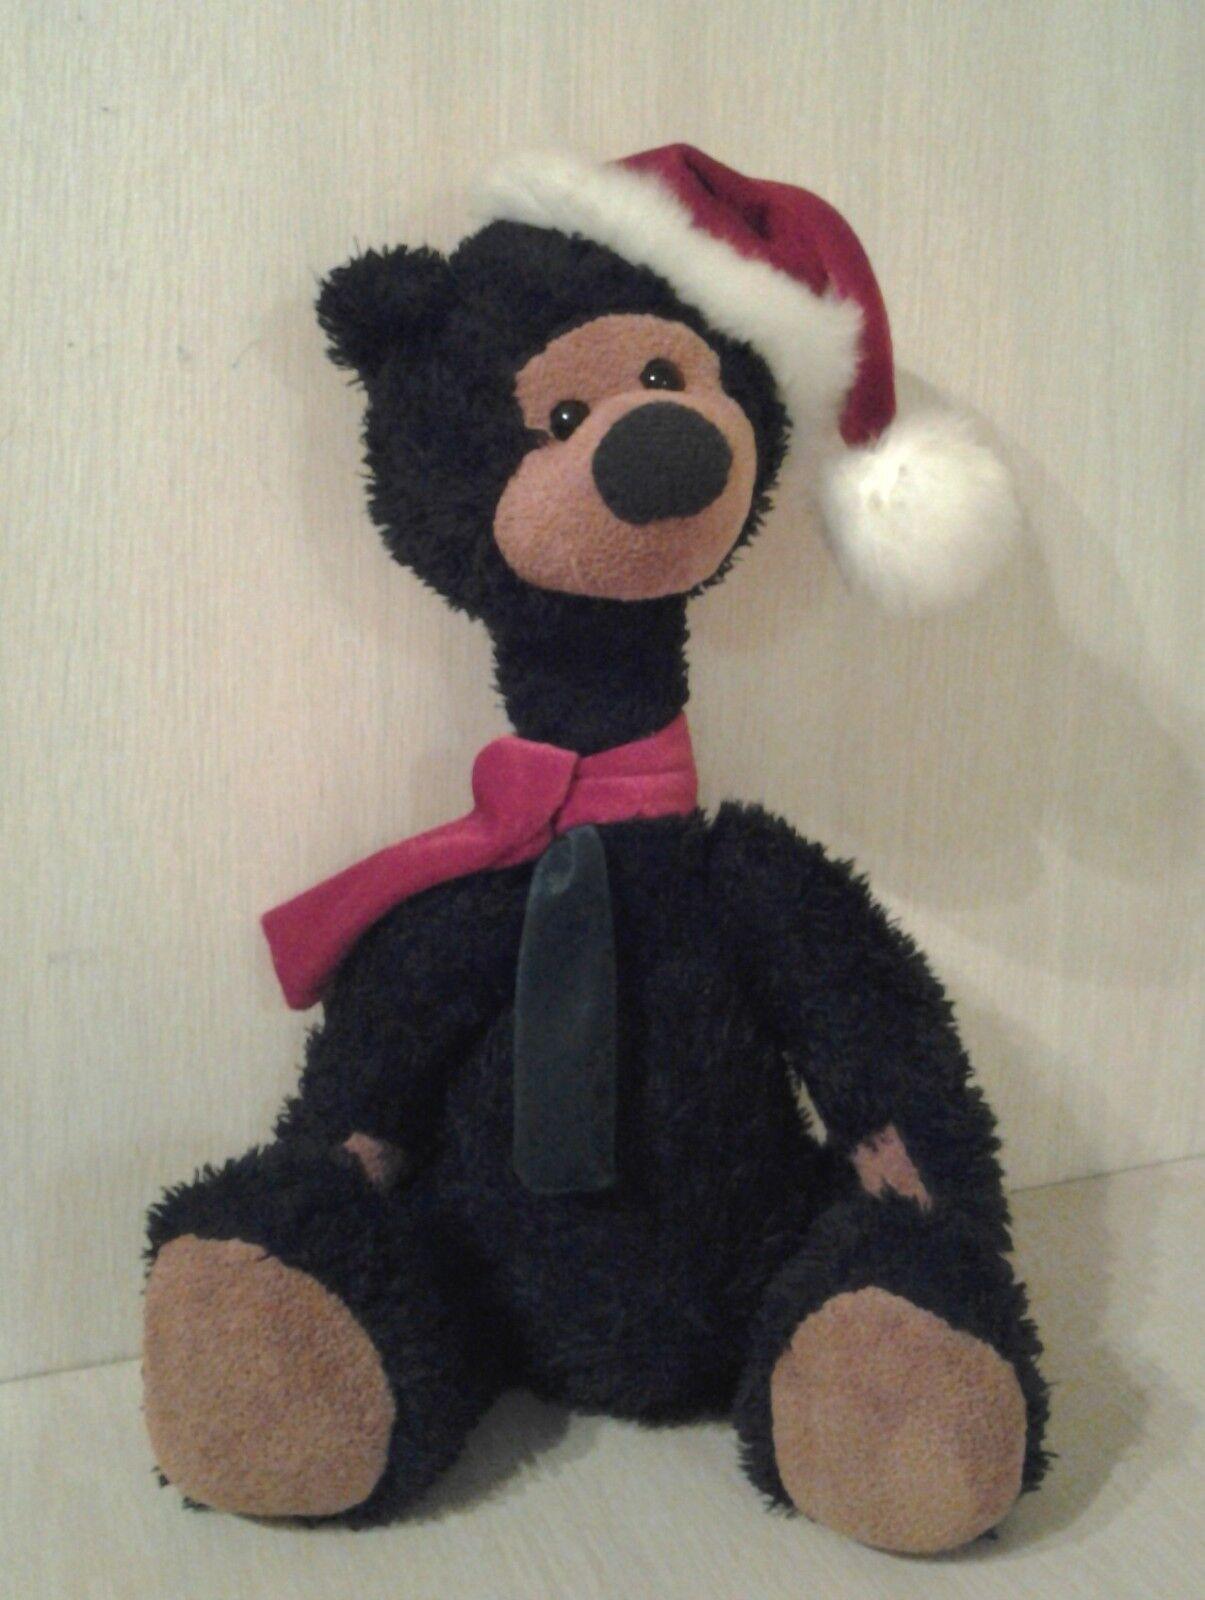 2003 Wishpets Teddy Bear Plush Holiday Christmas stuffed animal Rare HTF 16